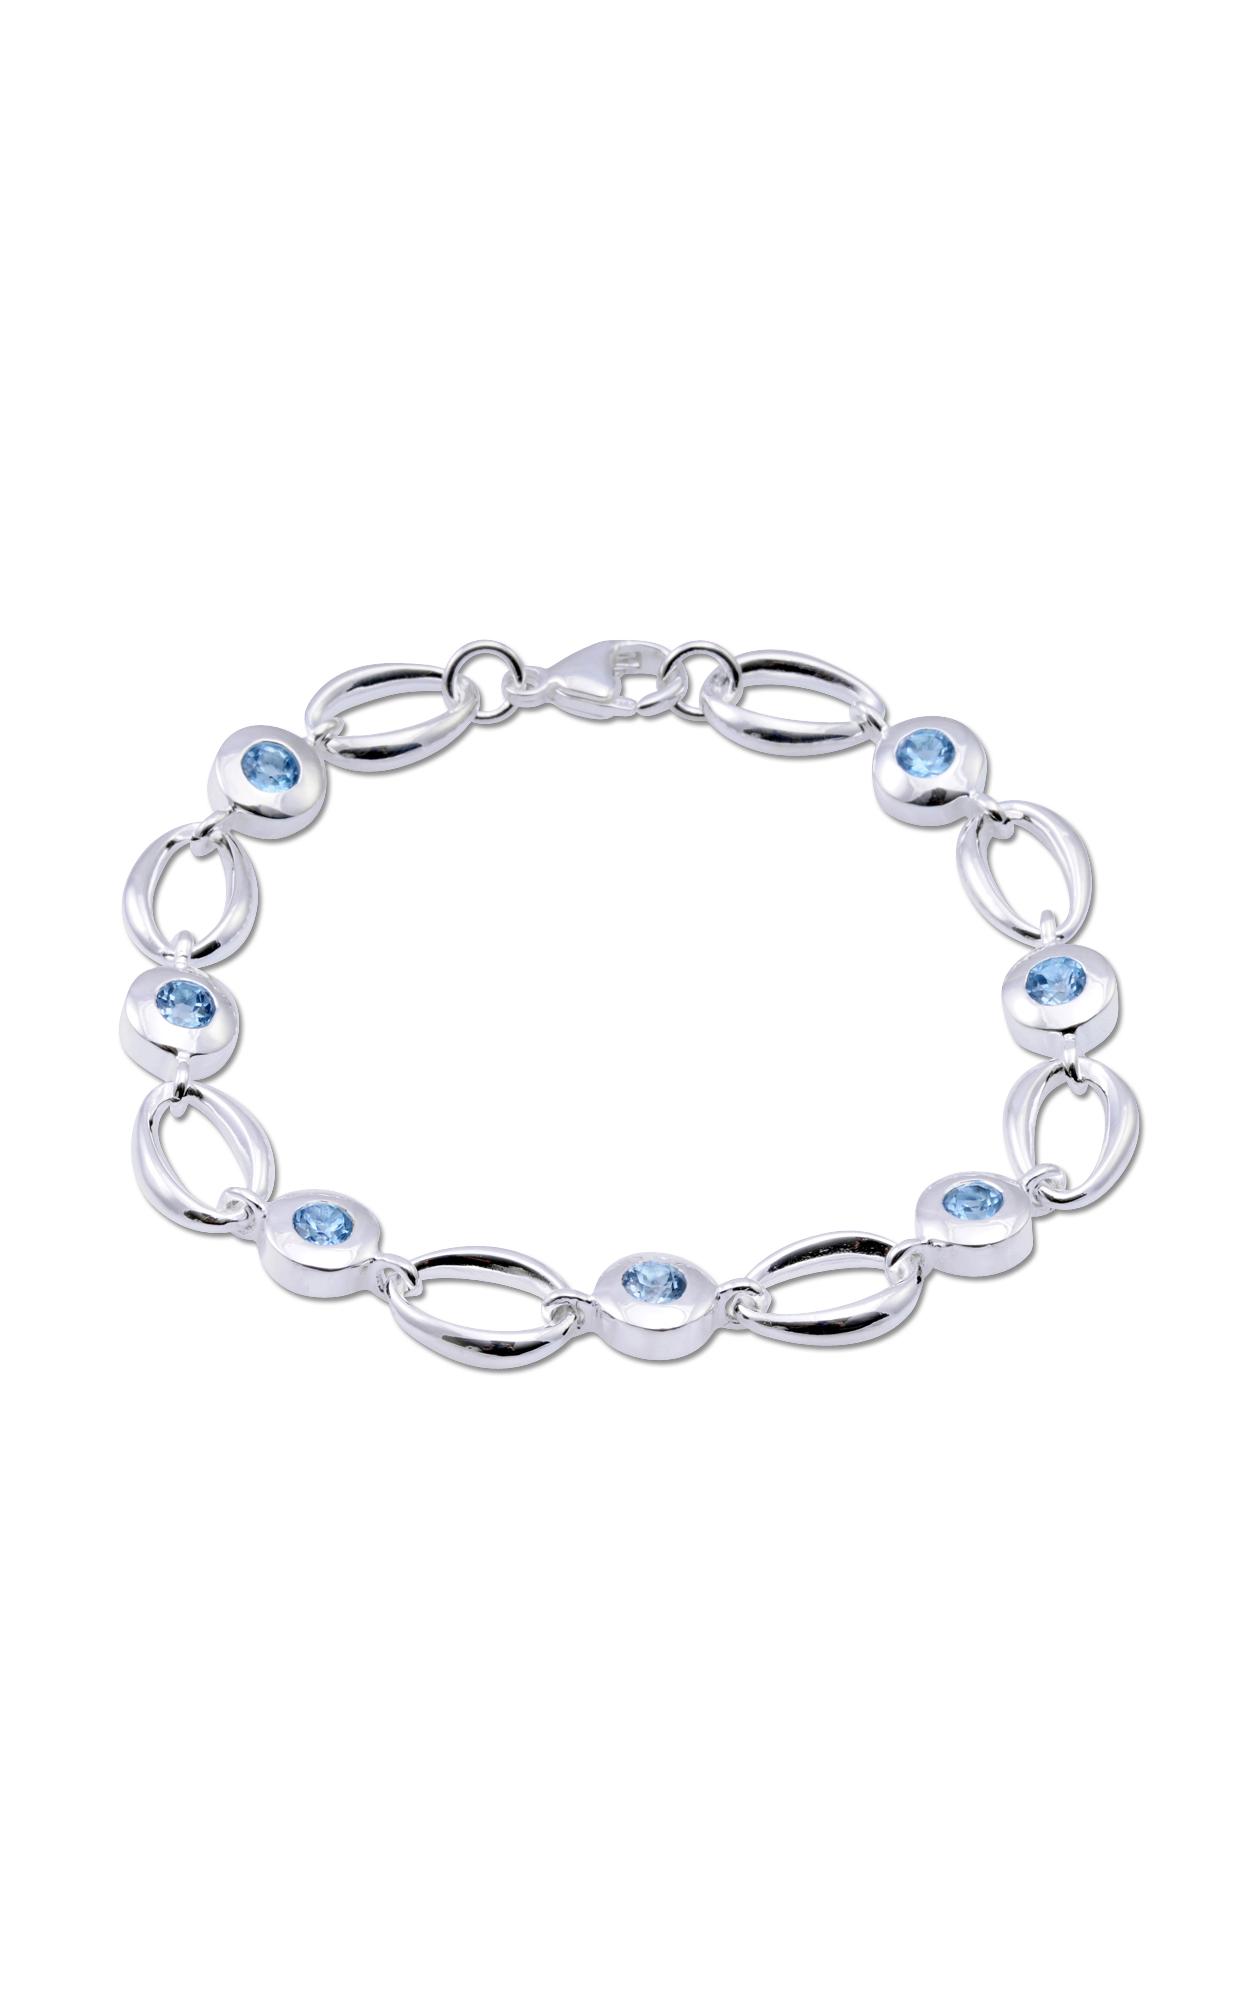 Zina Contemporary Bracelet A325-7-BT product image